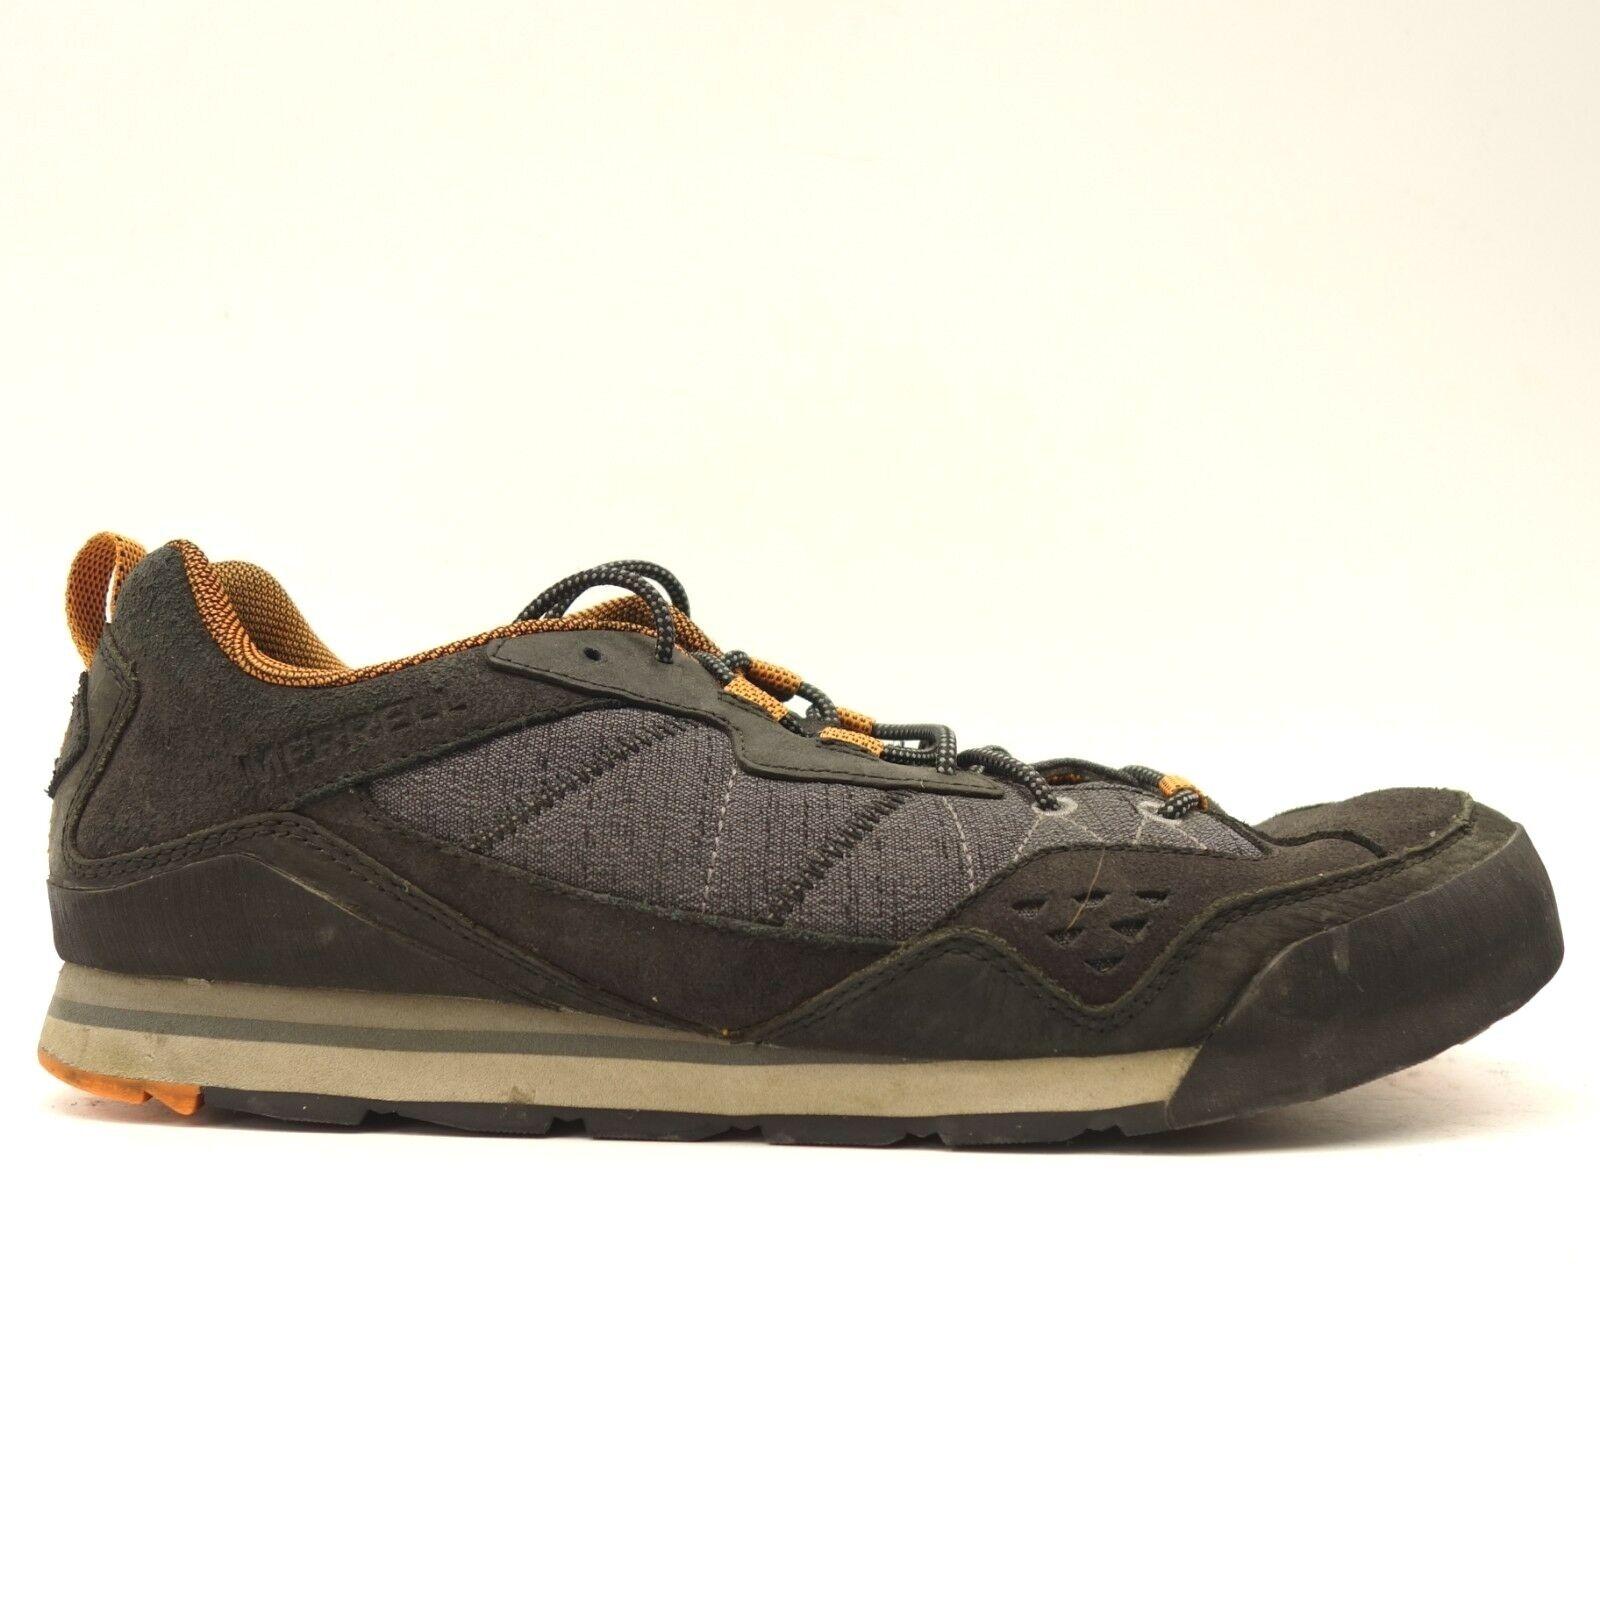 Merrell Para Hombre Quemado Rock Negro DEPORTIVOS ATLÉTICOS INFORMALES Trail Running Zapatos